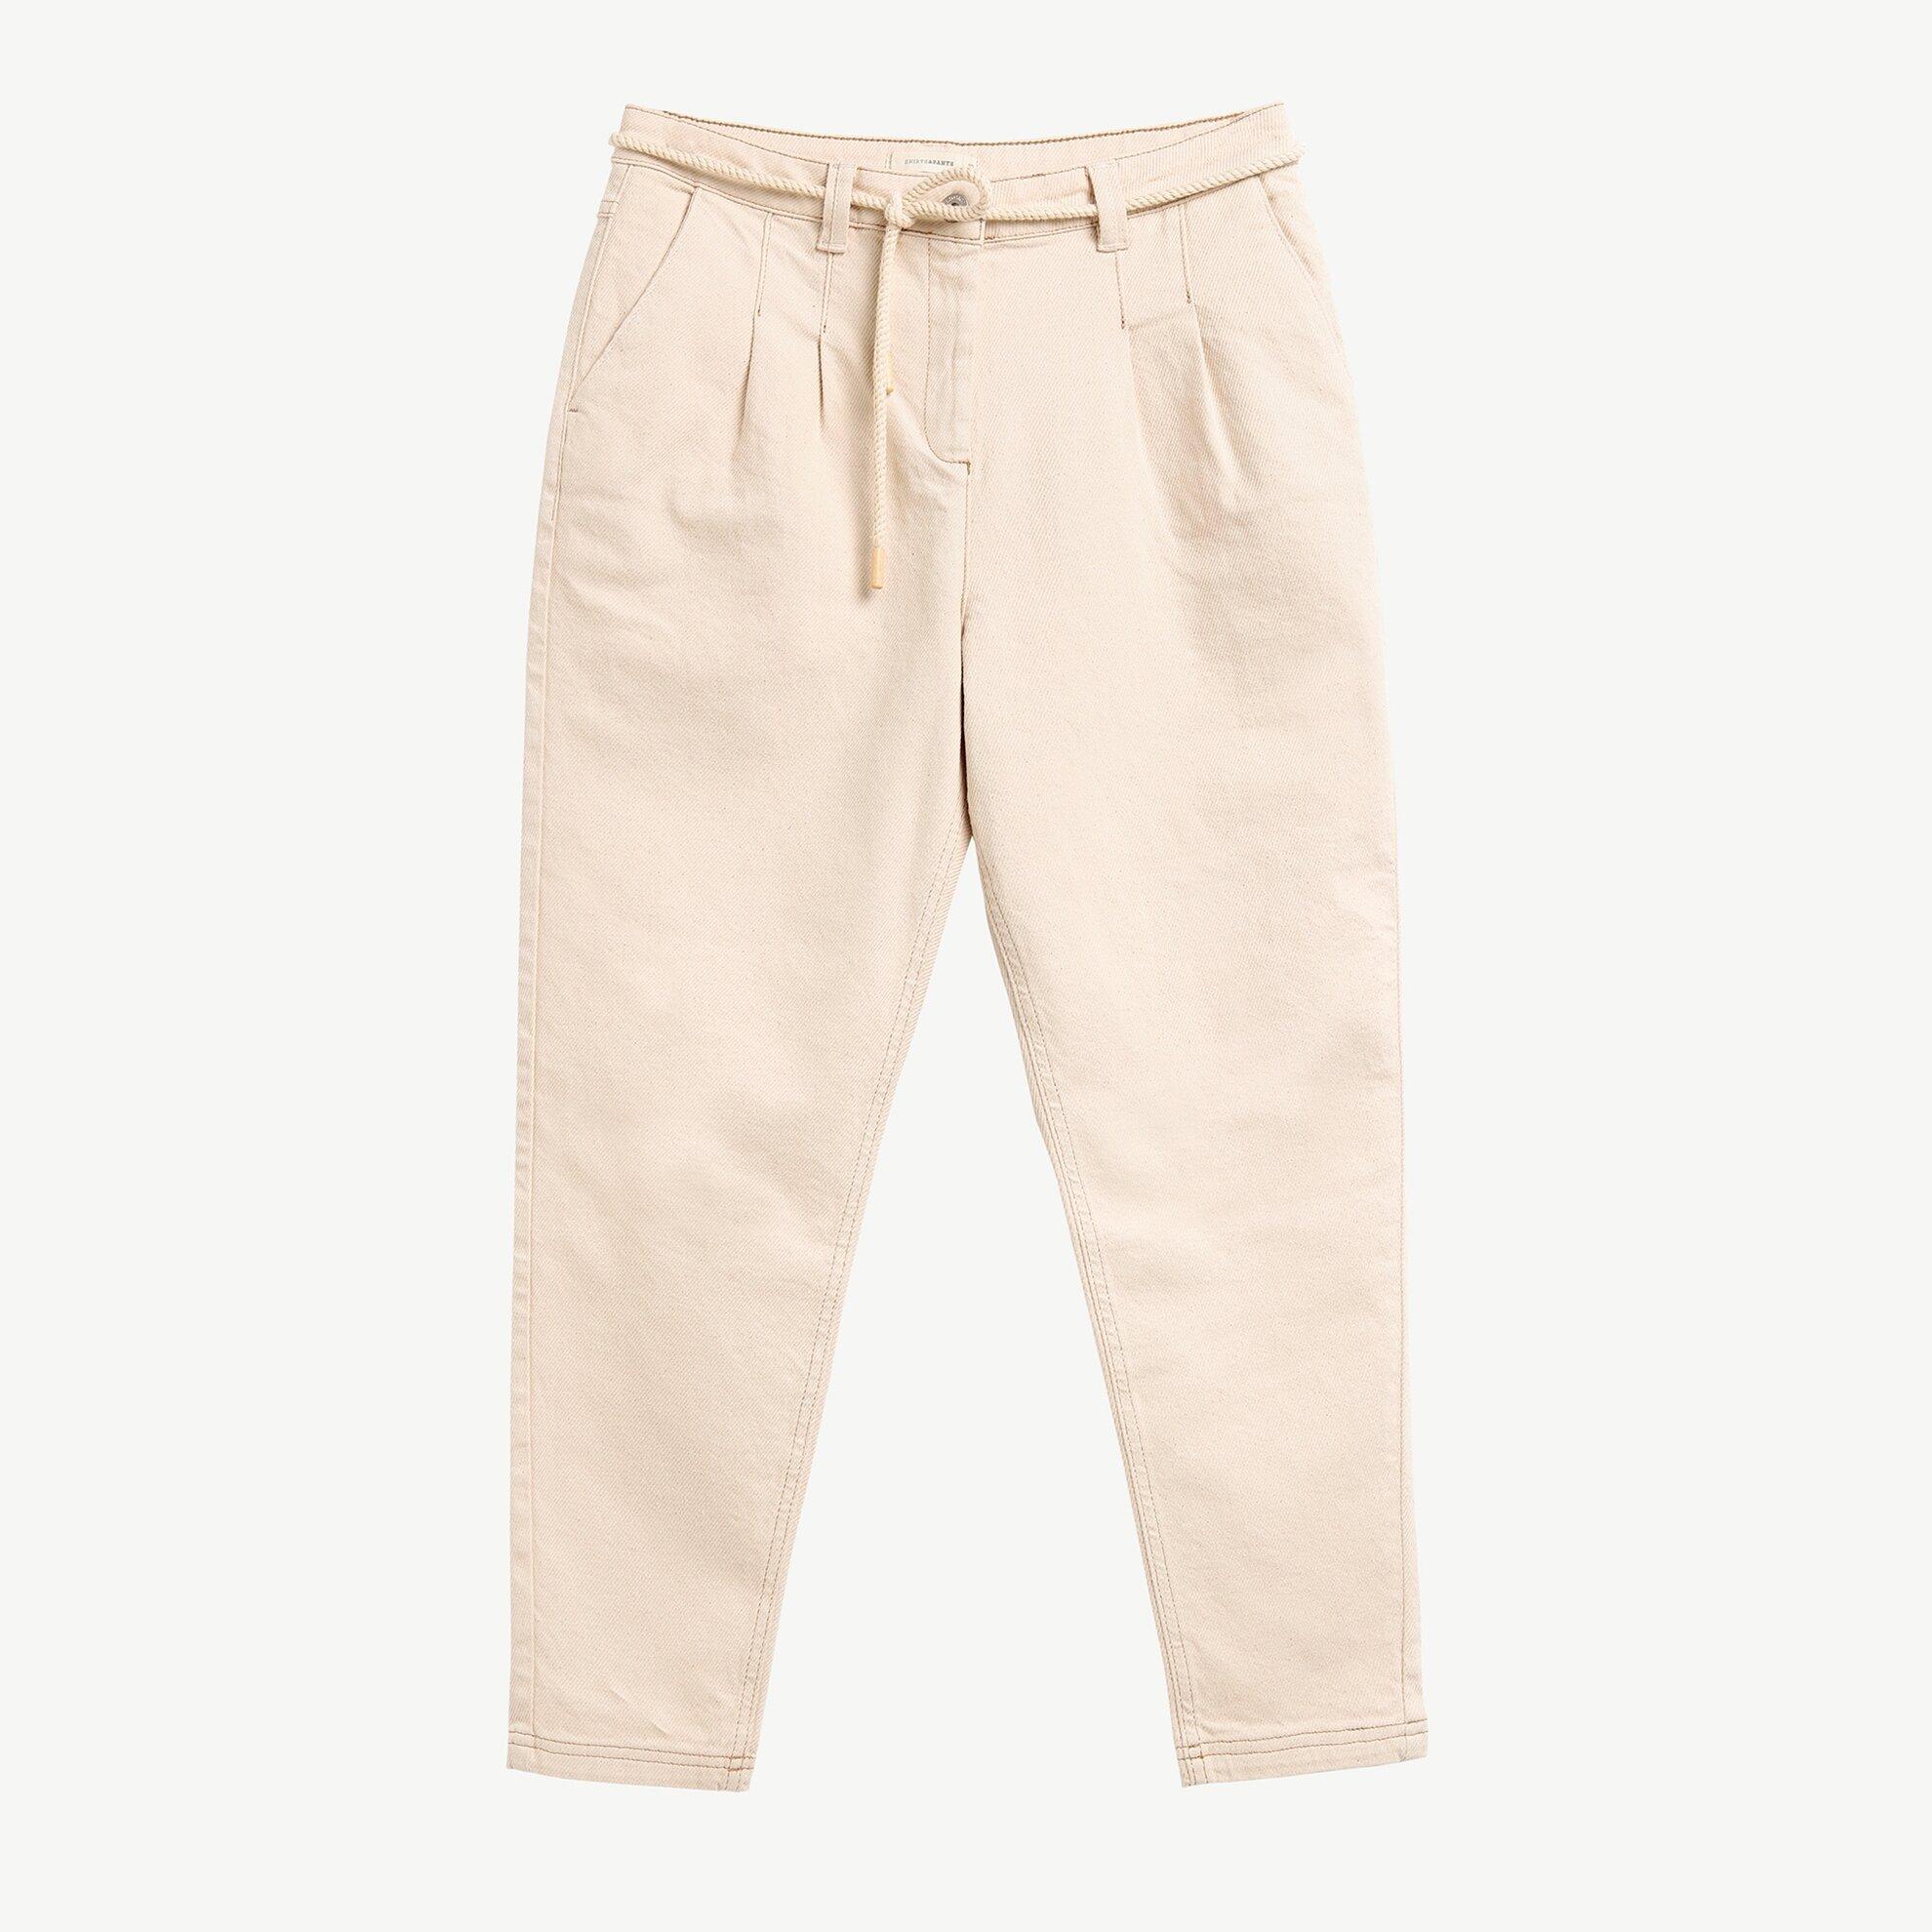 Belt Detailed Carrot Trousers